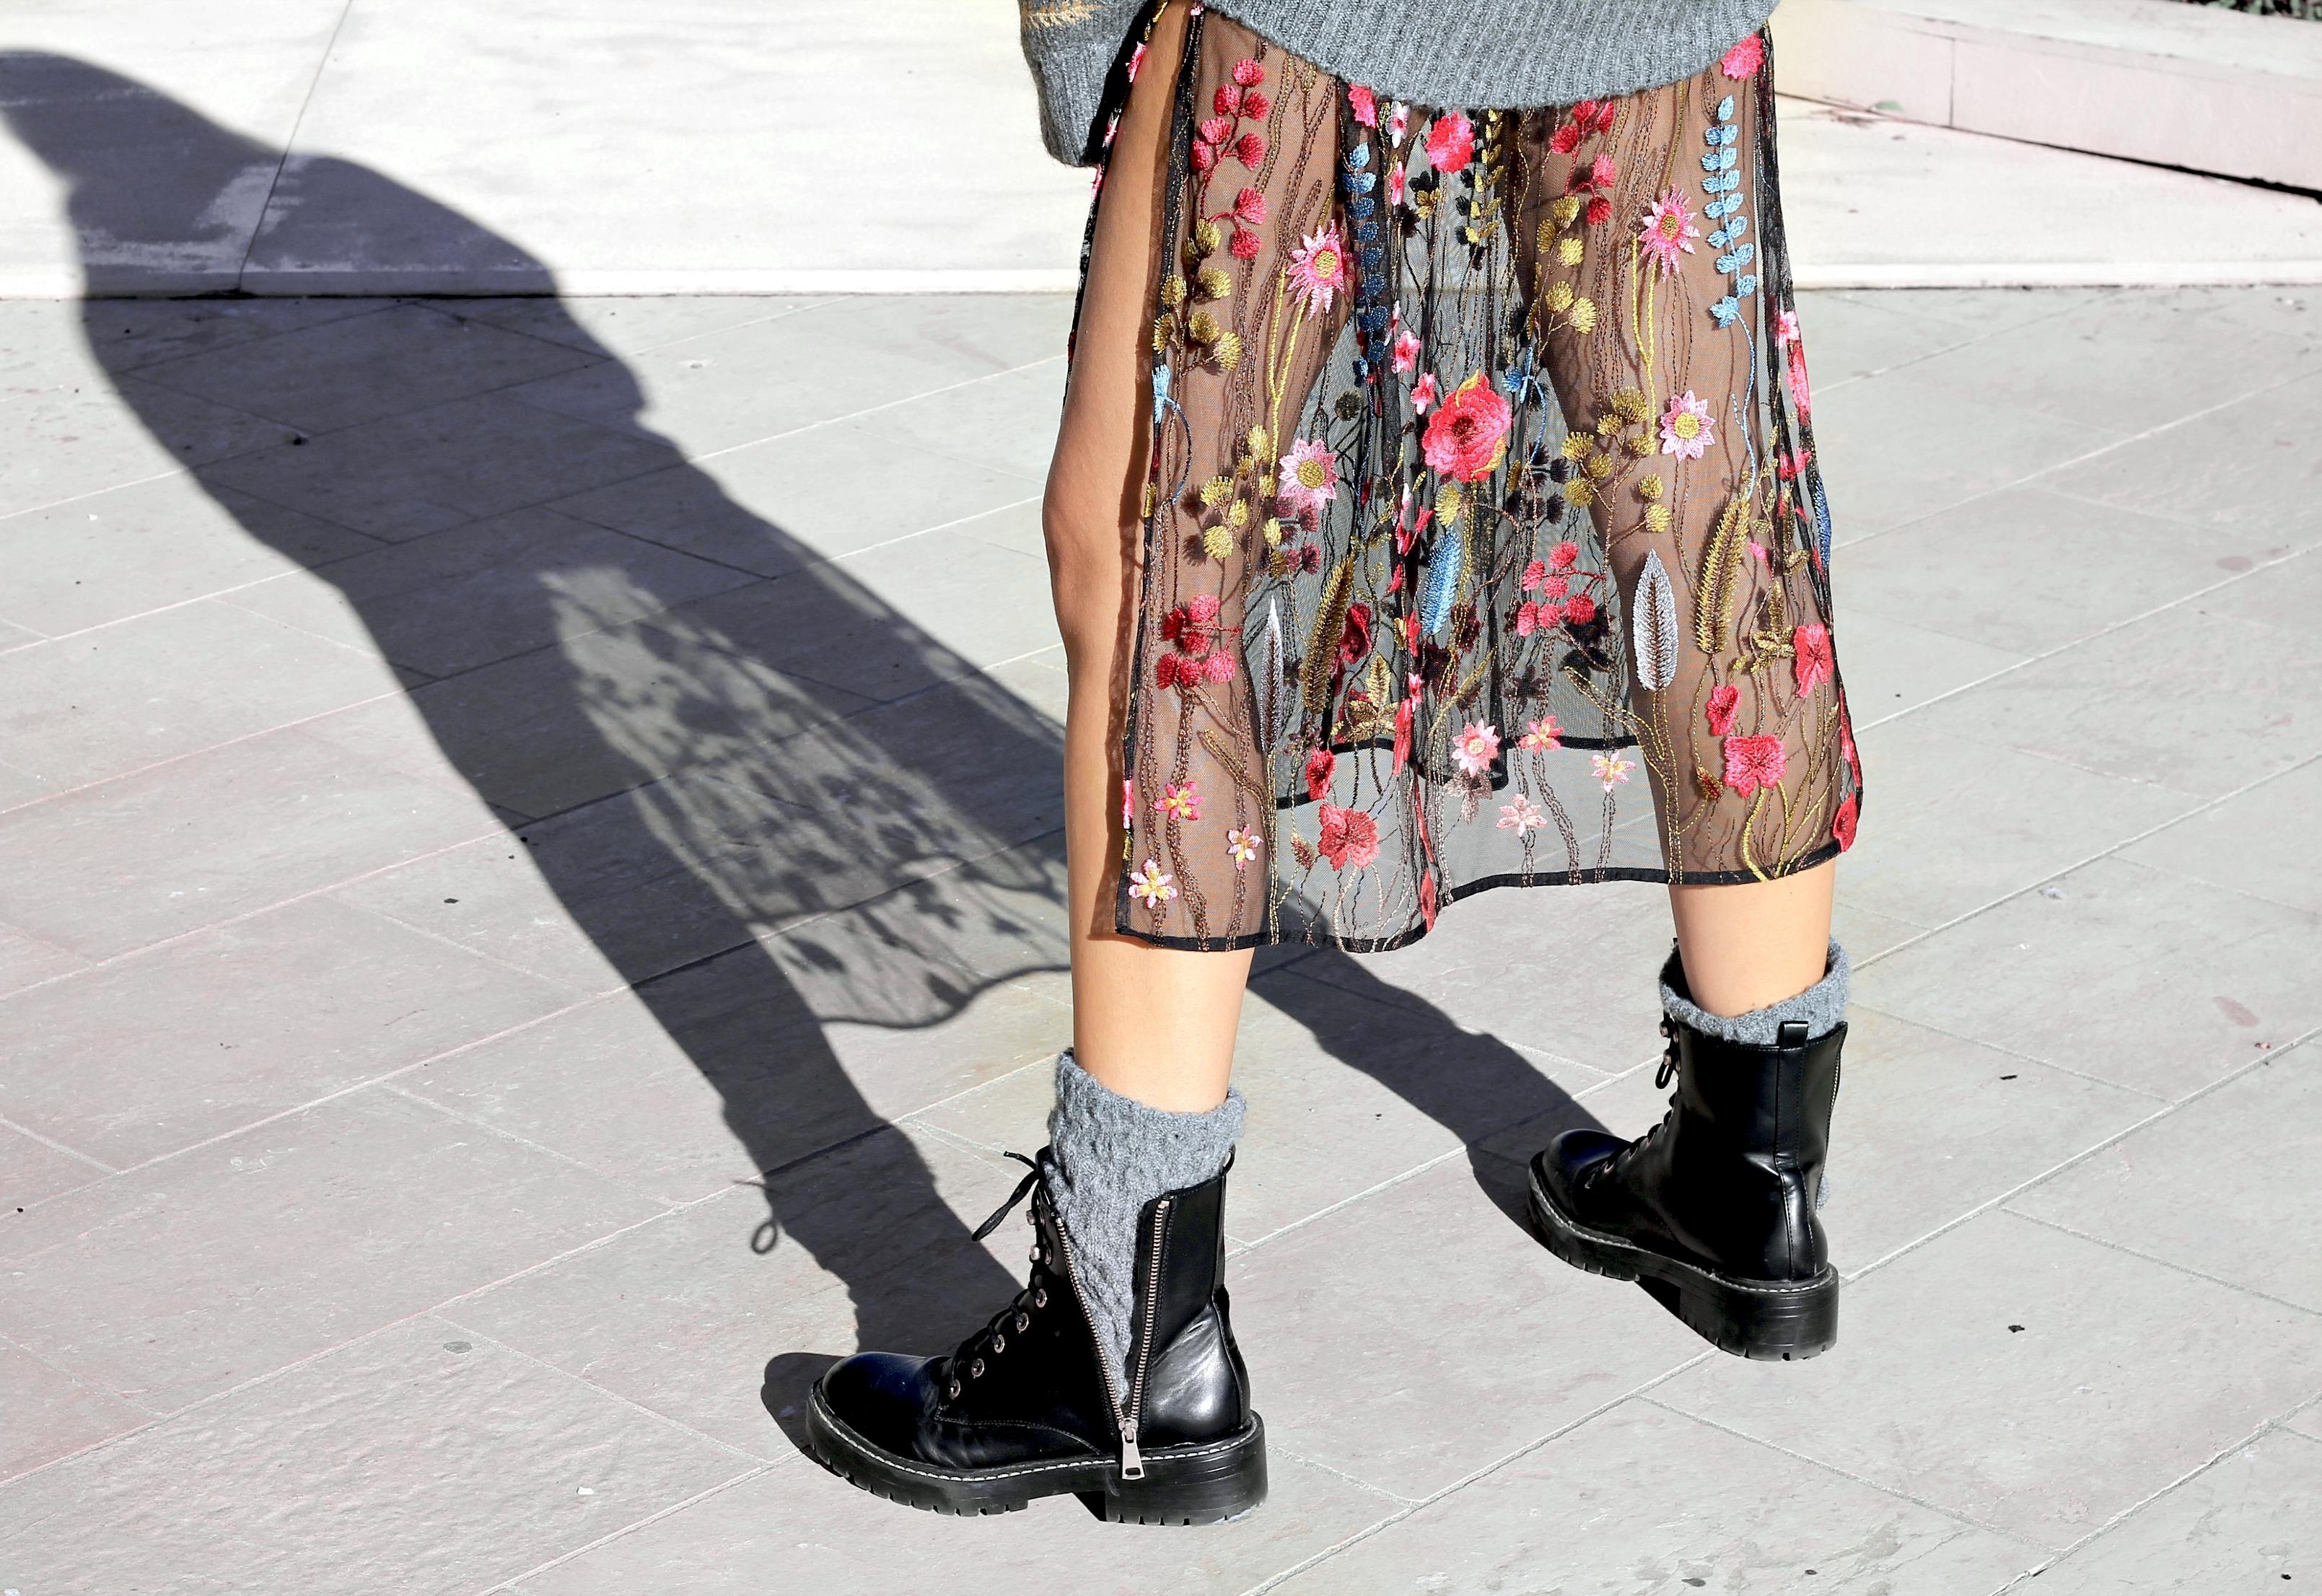 Métiers D'Art Chanel 2016/17, theladycracy.it, elisa bellino, fashion blog italia 2016, fashion blogger italiane 2016, fashion blogger italiane più seguite 2016, blogger moda 2016, maglione zara inverno 2016, come vestirsi inverno 2016, outfit inverno 2016 blogger, come vestirsi alla moda inverno 2016, zara look fall 2016